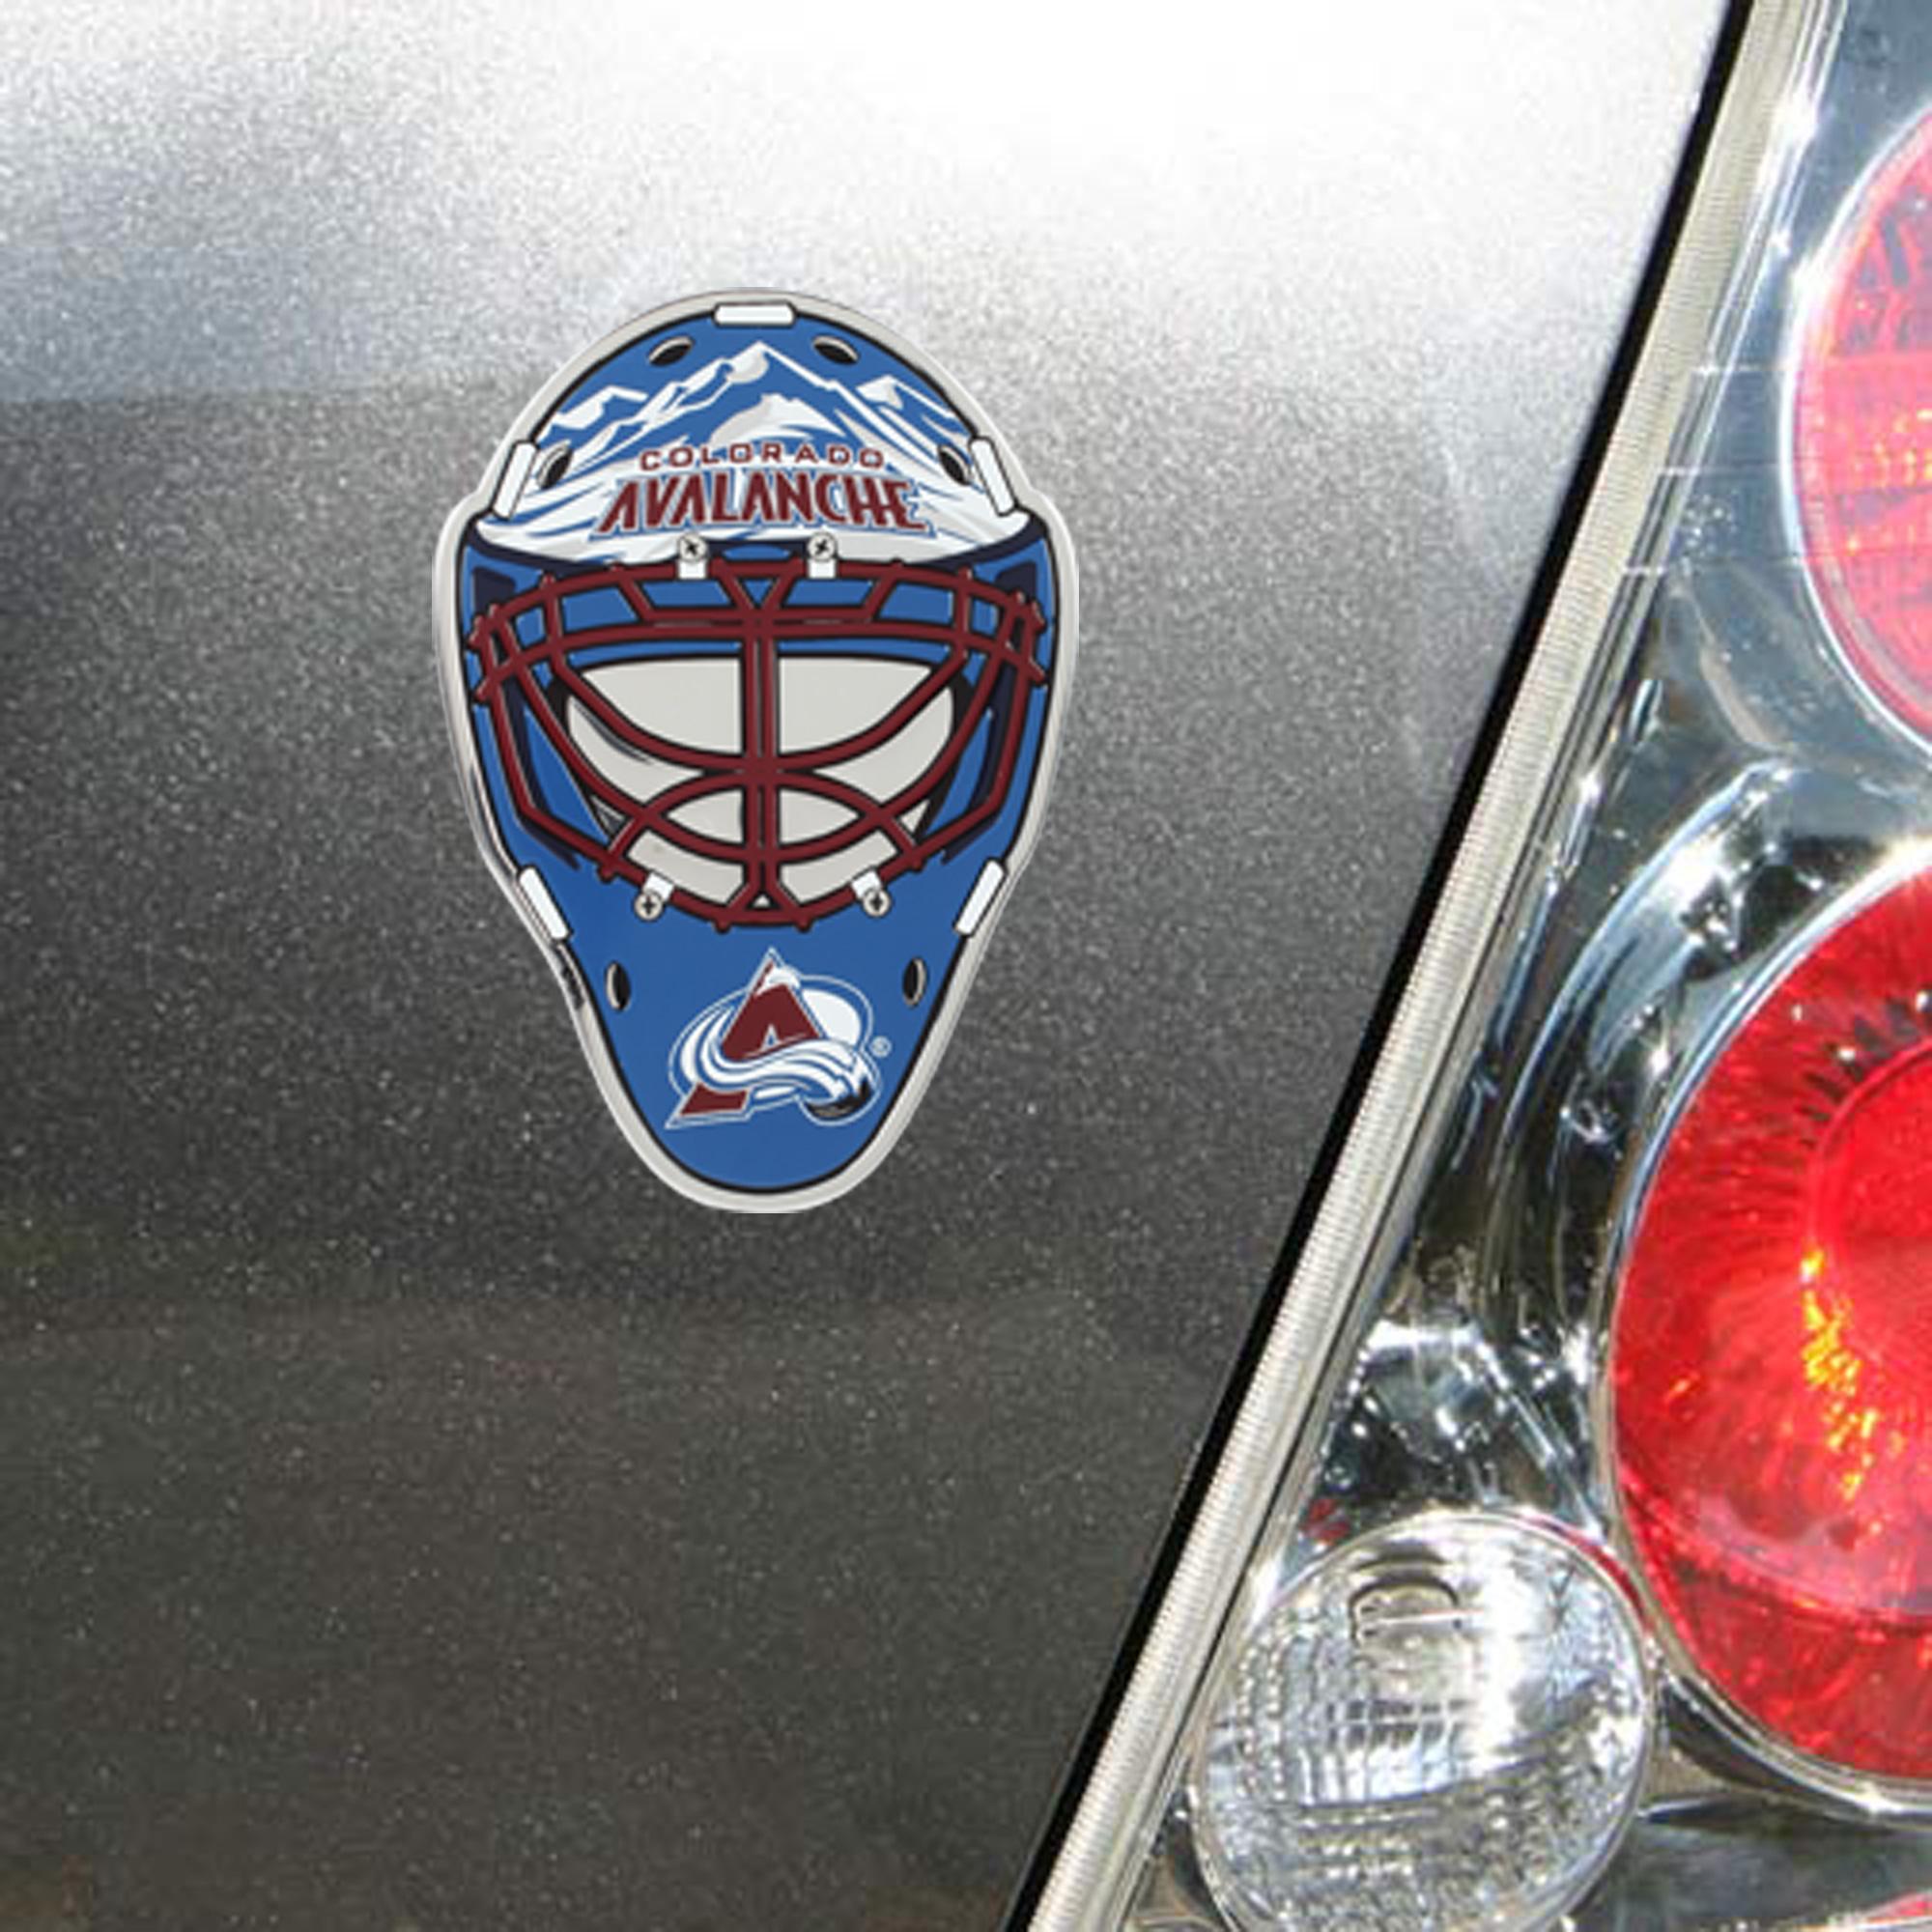 Colorado Avalanche Goalie Mask Auto Emblem - No Size